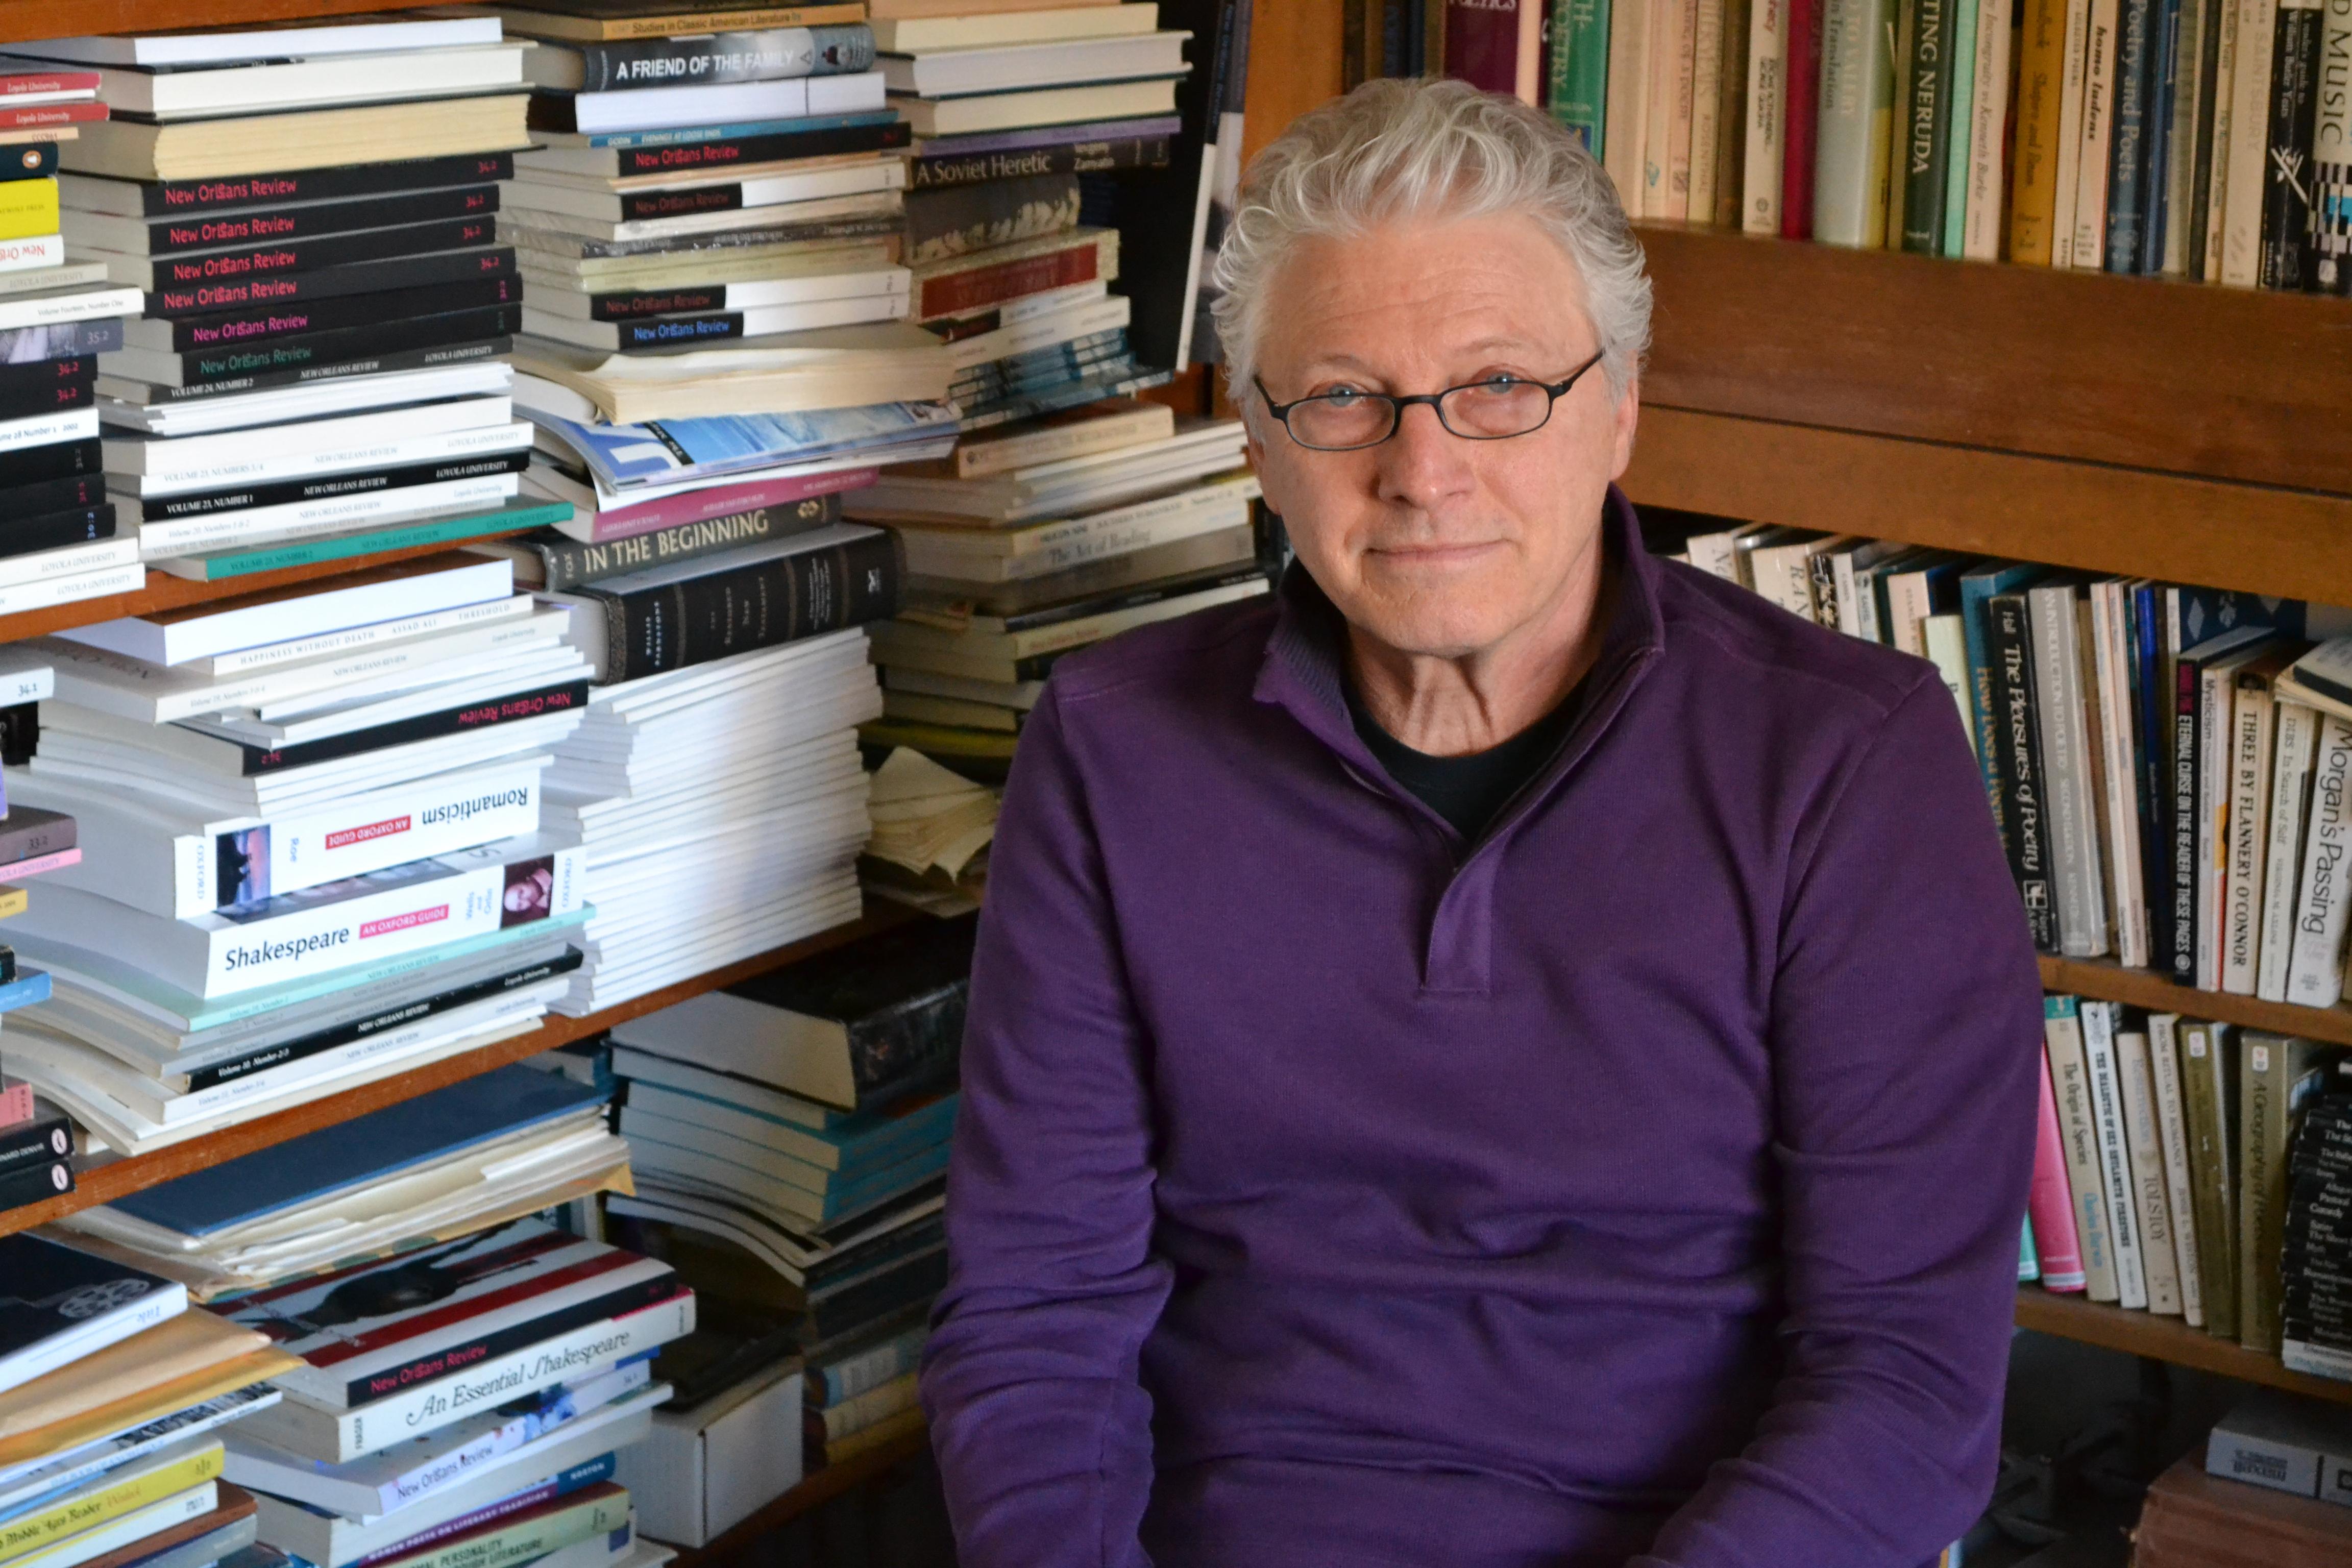 John Biguenet